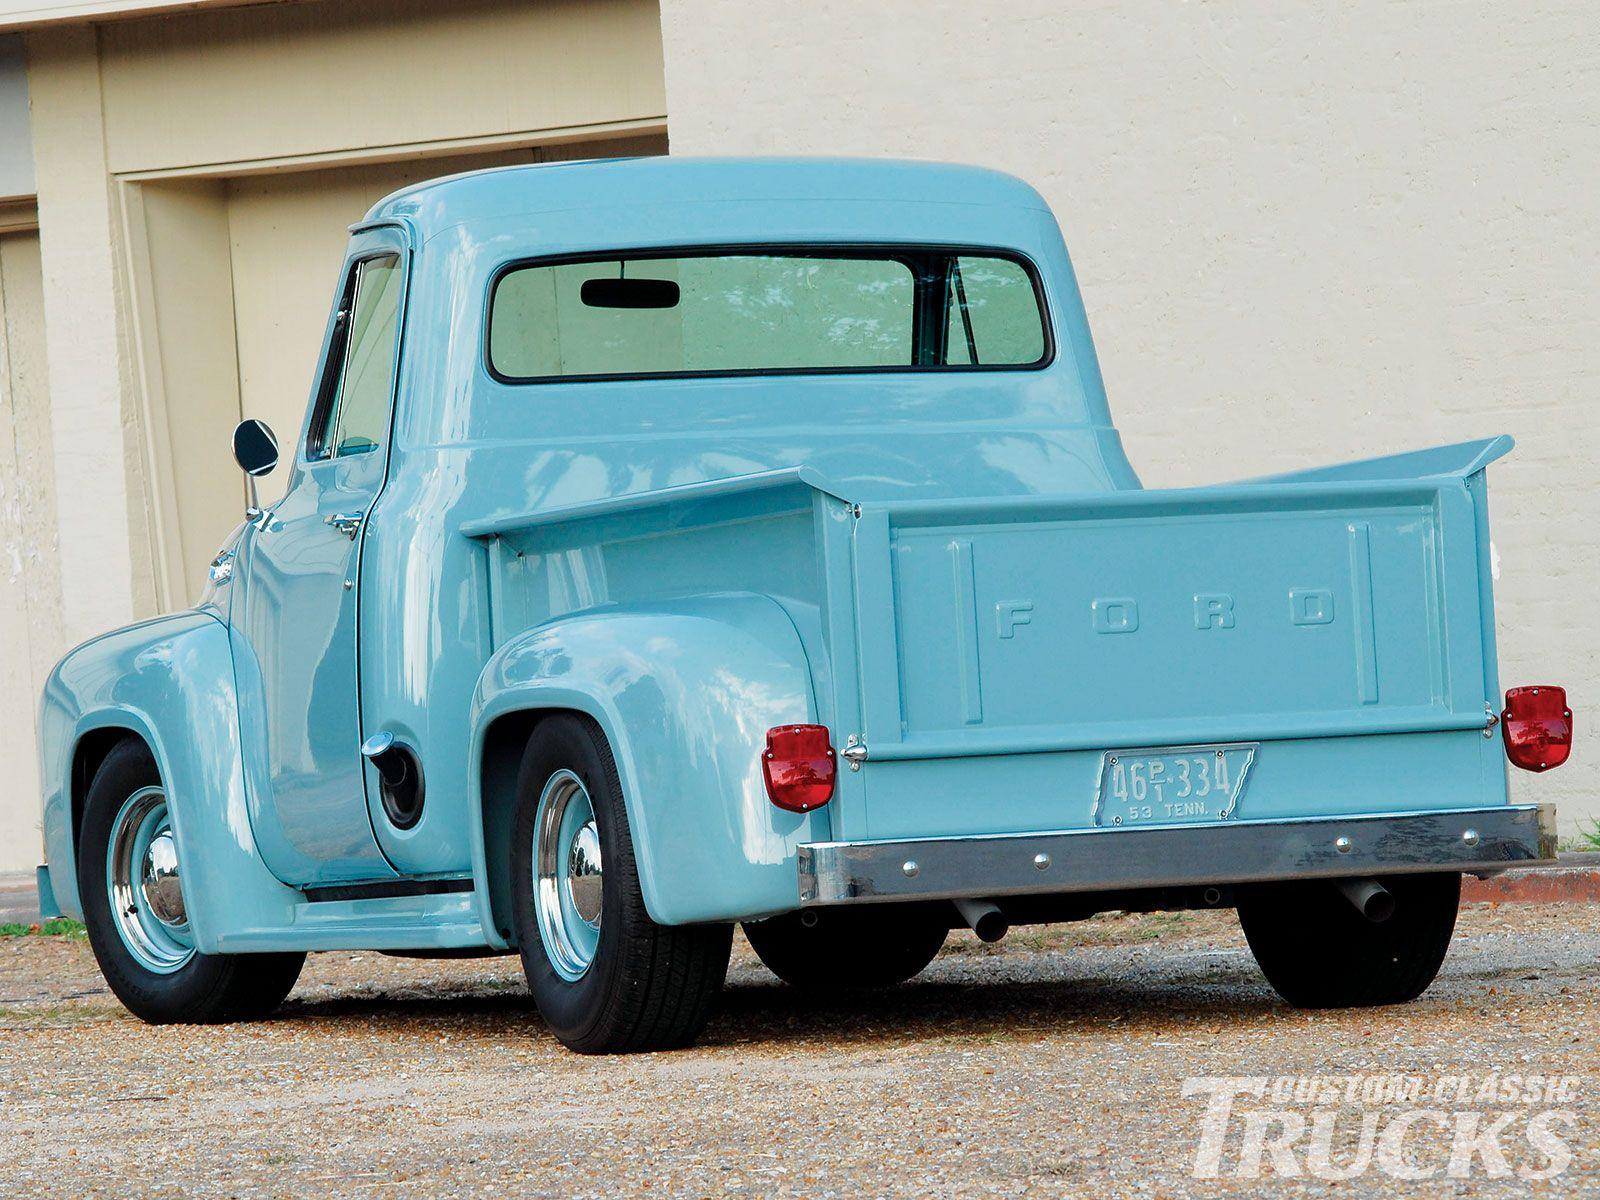 1953 ford pickup truck | 1953 Ford F 100 Rear Left View | Trucks ...